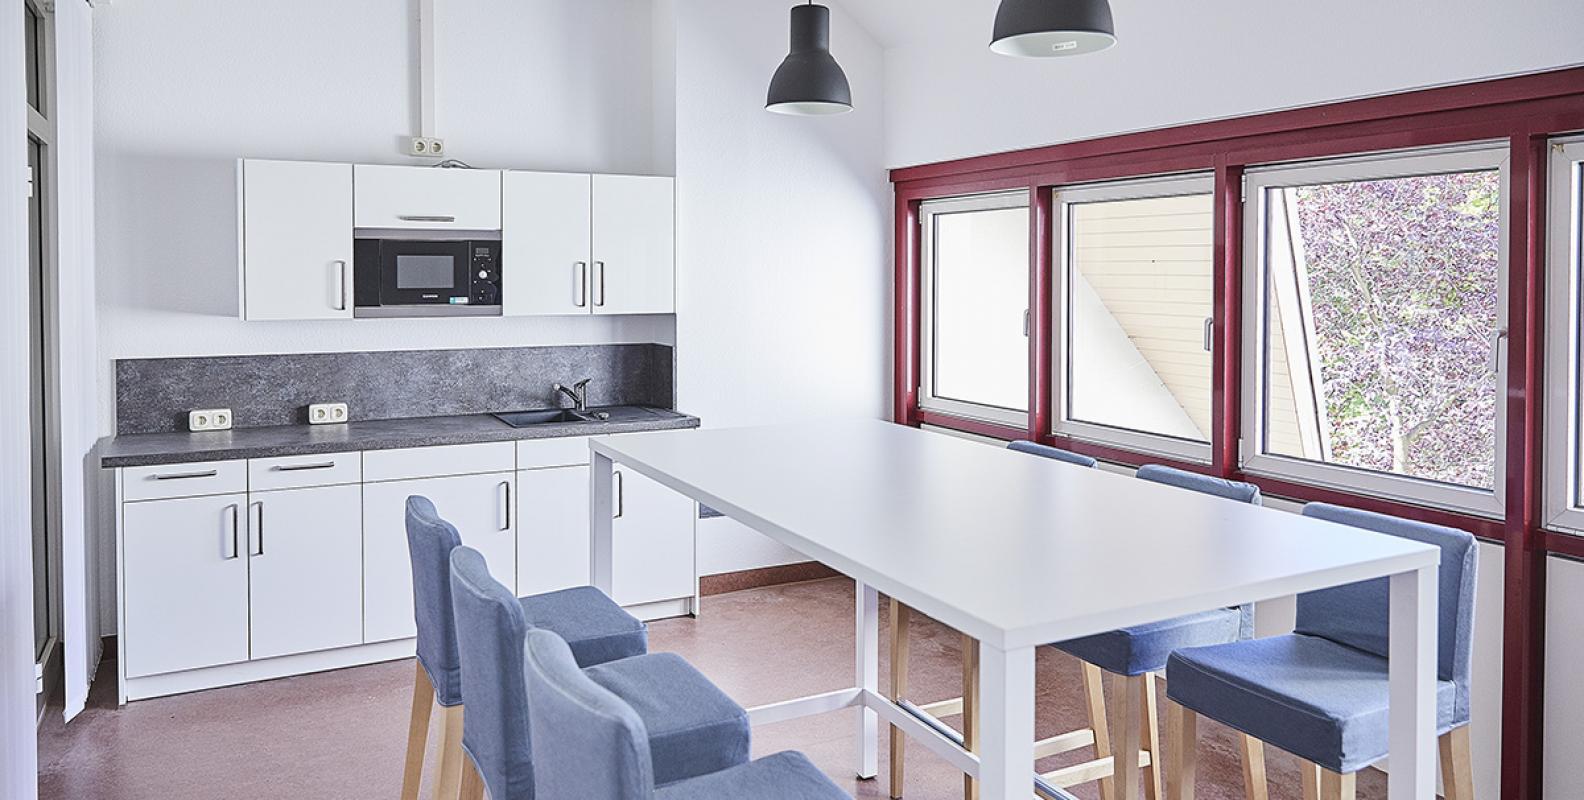 Co-office Kitchen